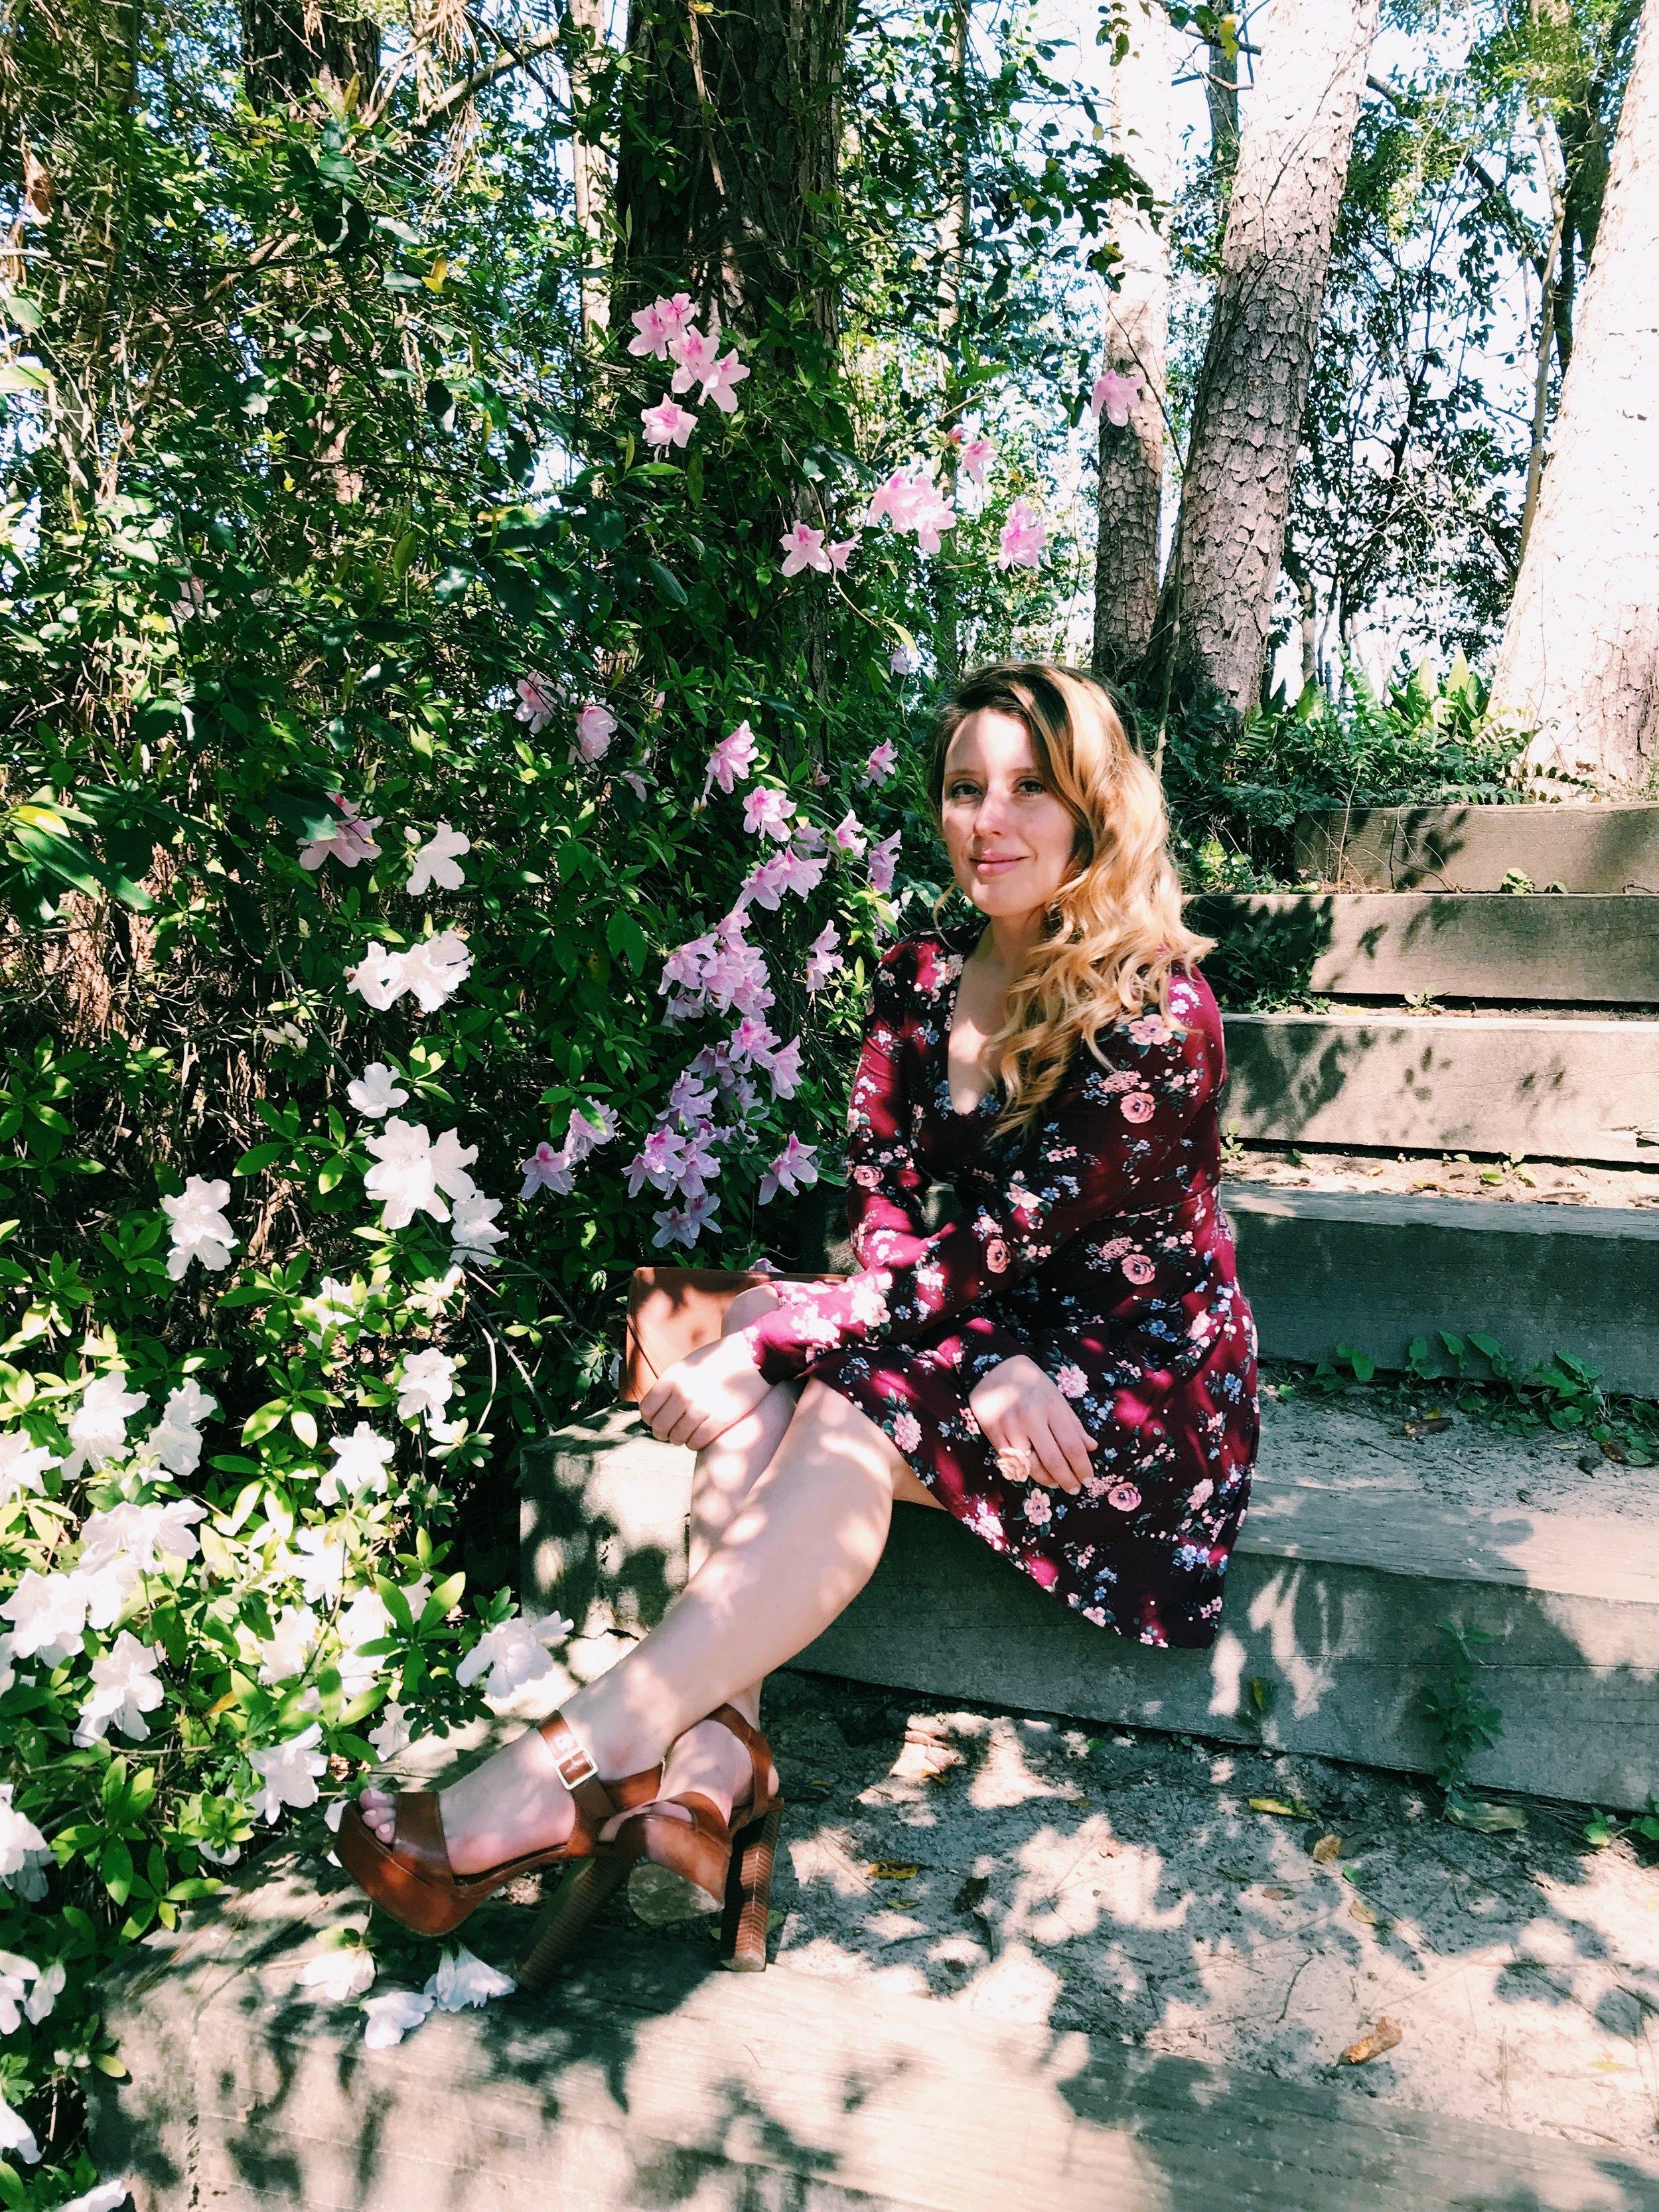 Three Heel Clicks - Three Looks with a Floral Spring Dress (31).jpg